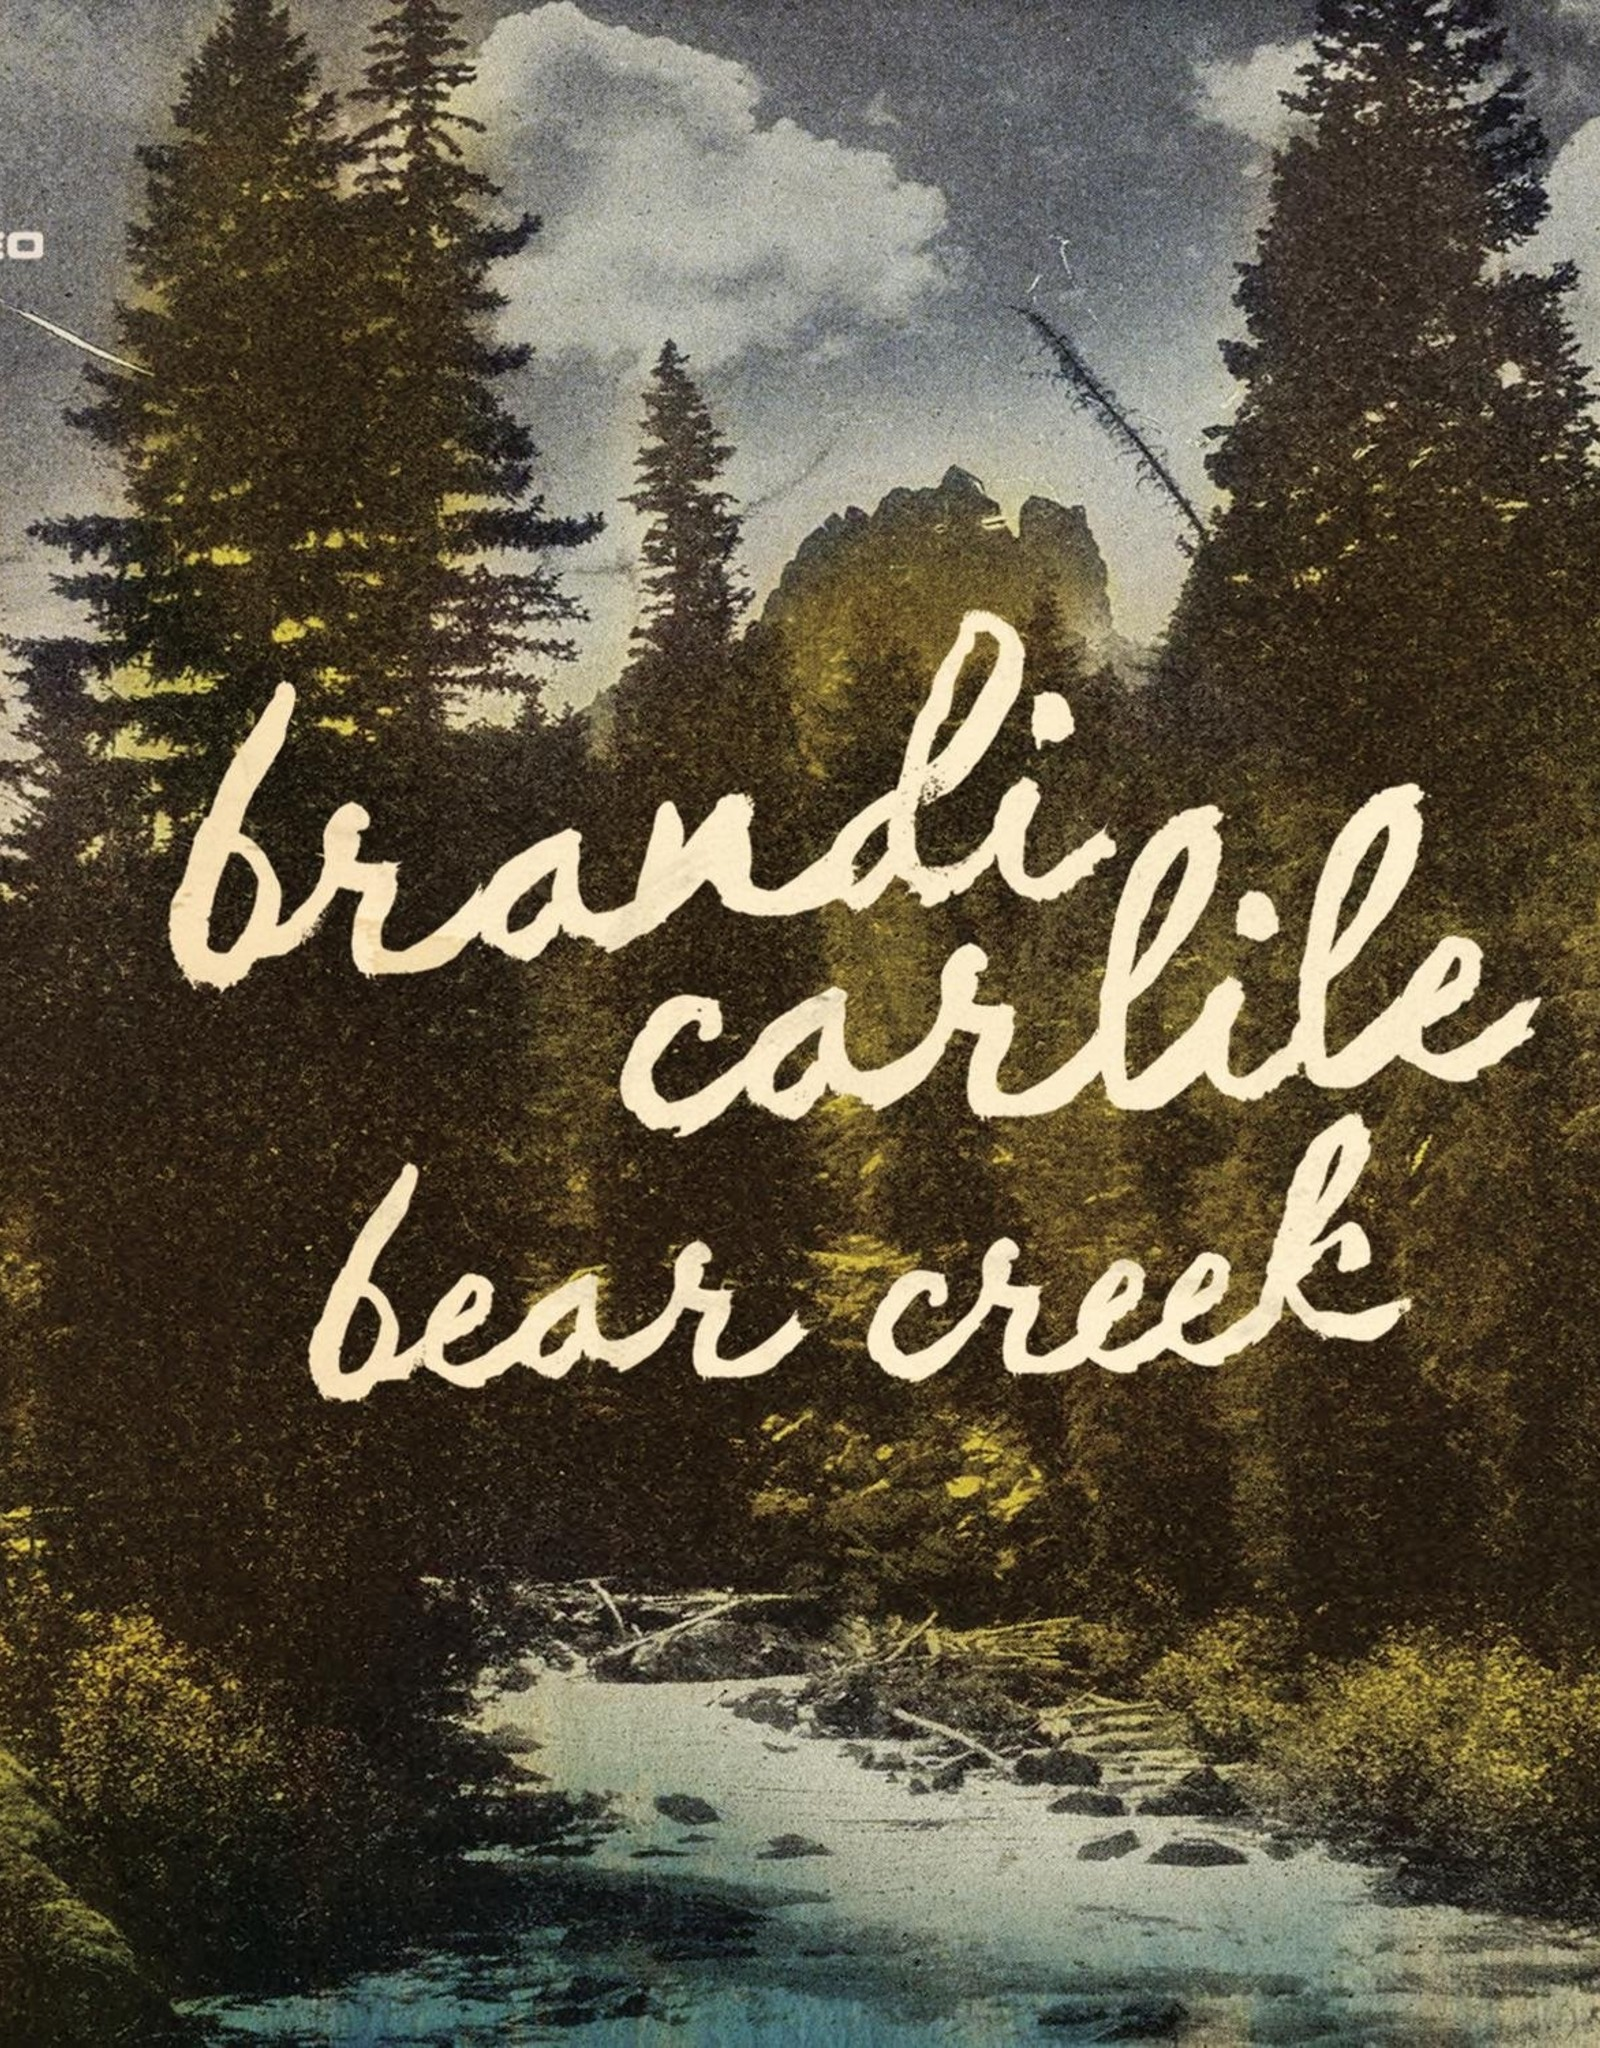 Brandi Carlile - Bear Creak